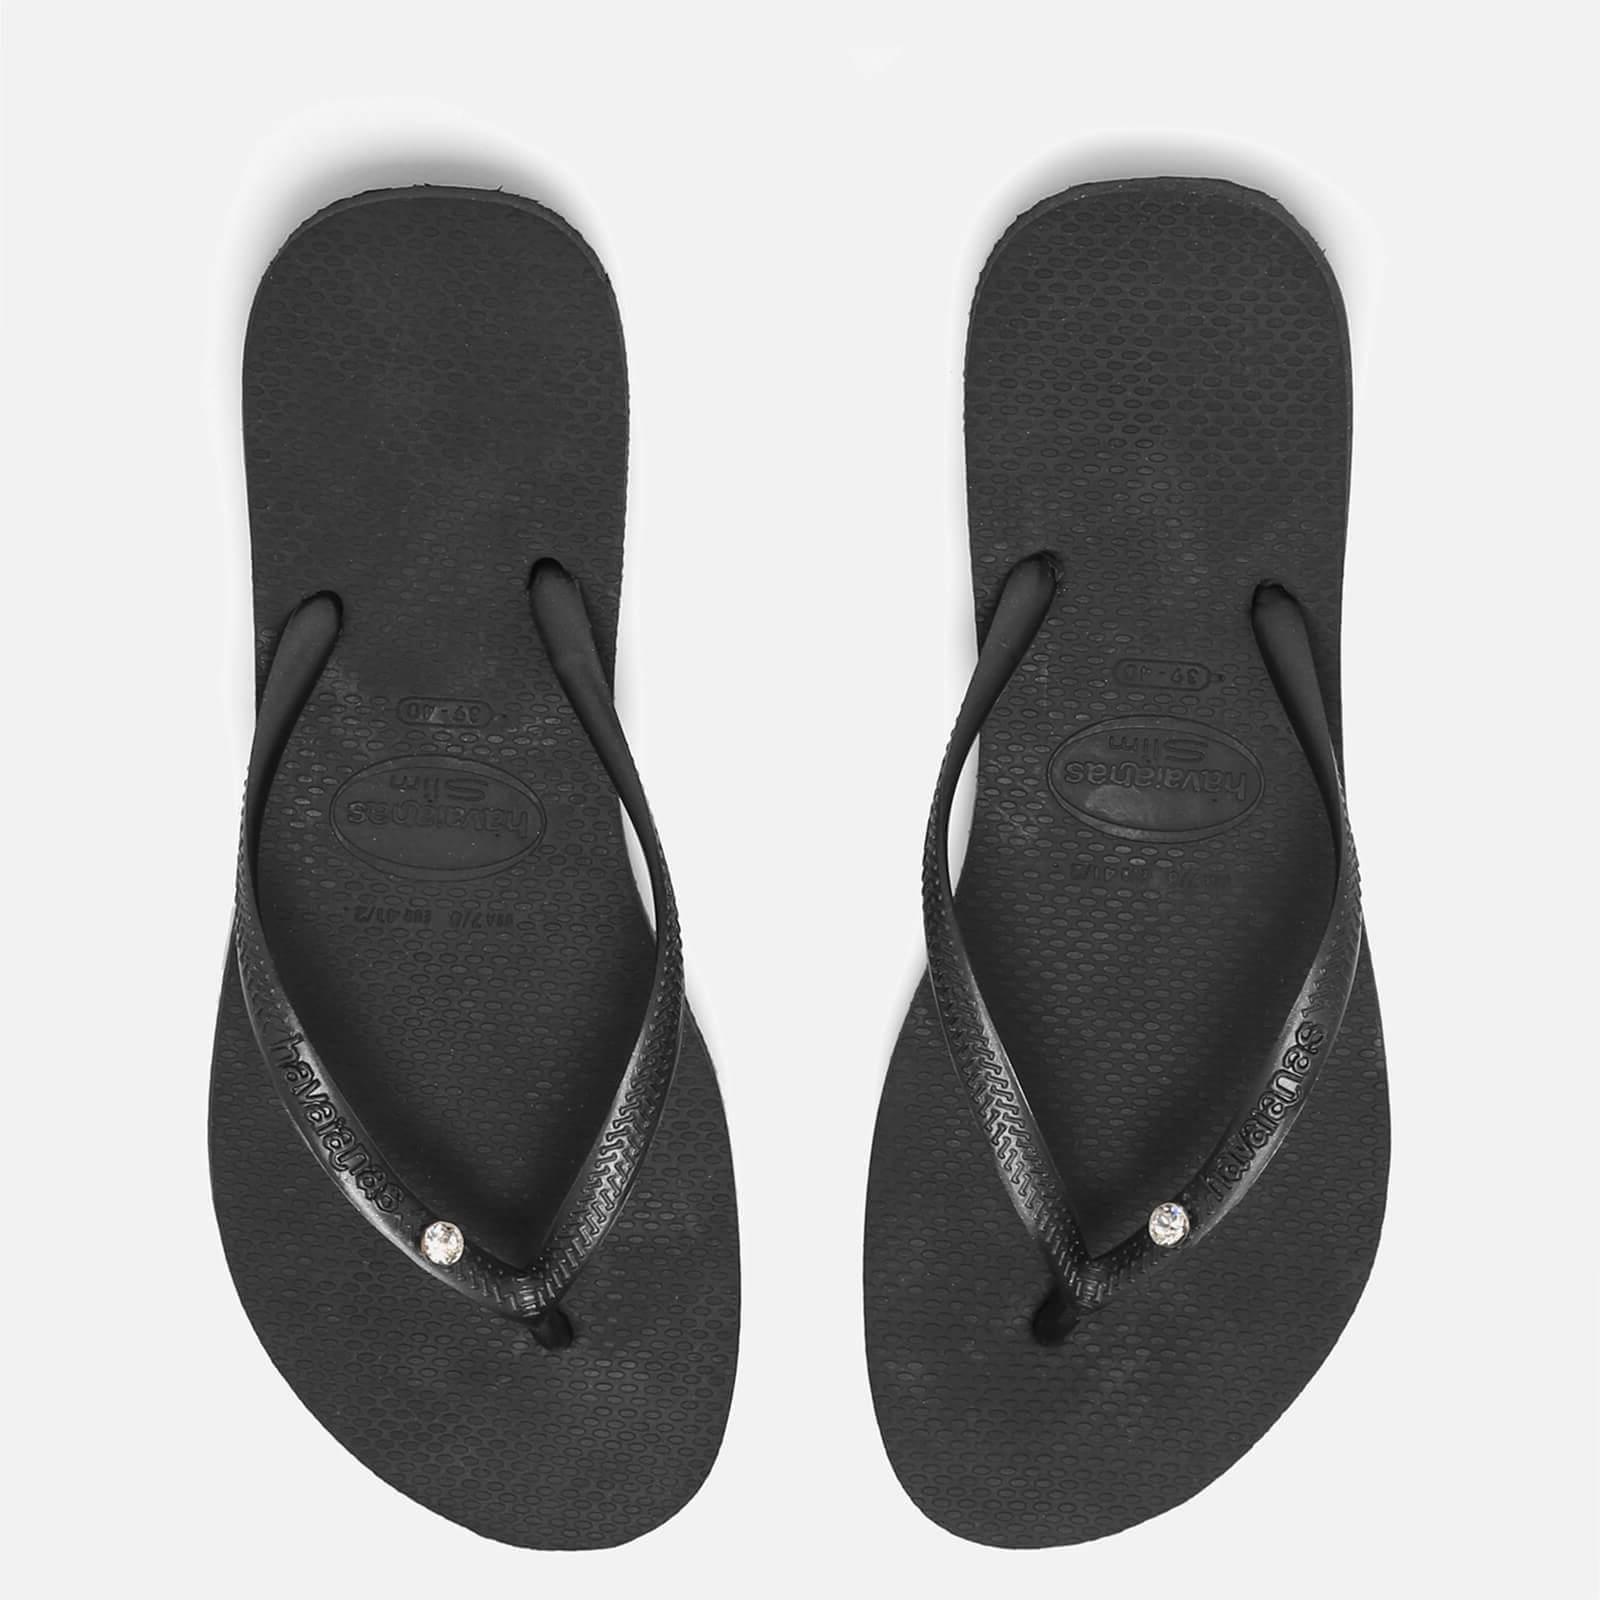 8d47158b4835 Havaianas Women s Slim Swarovski Crystal Glamour Flip Flops - Black ...